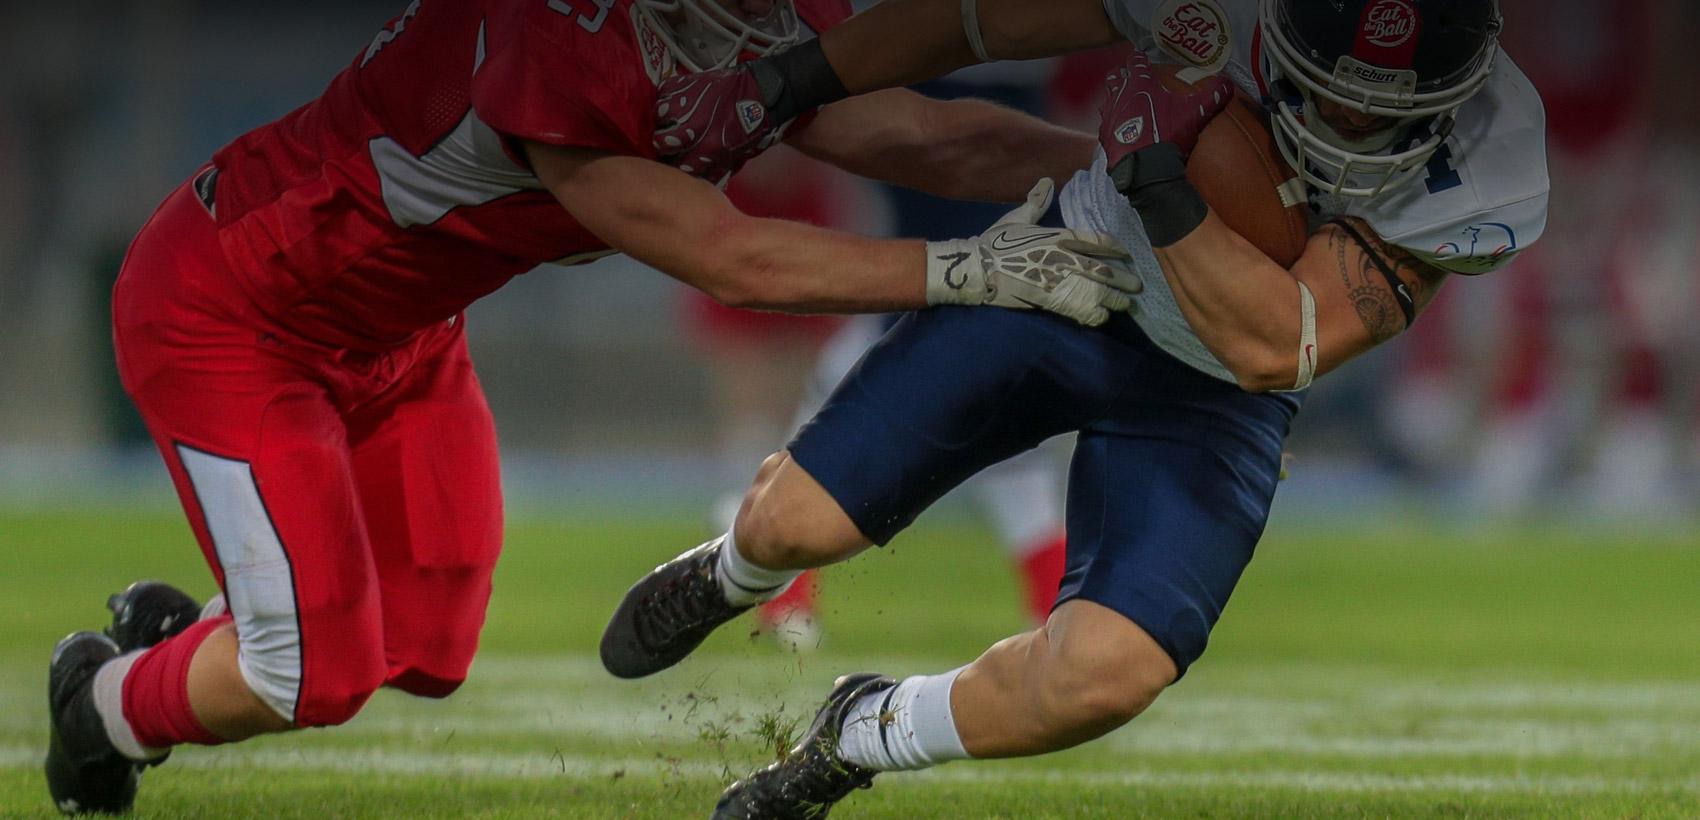 Entretien terrains sportifs, football, soccer, balle-molle, baseball